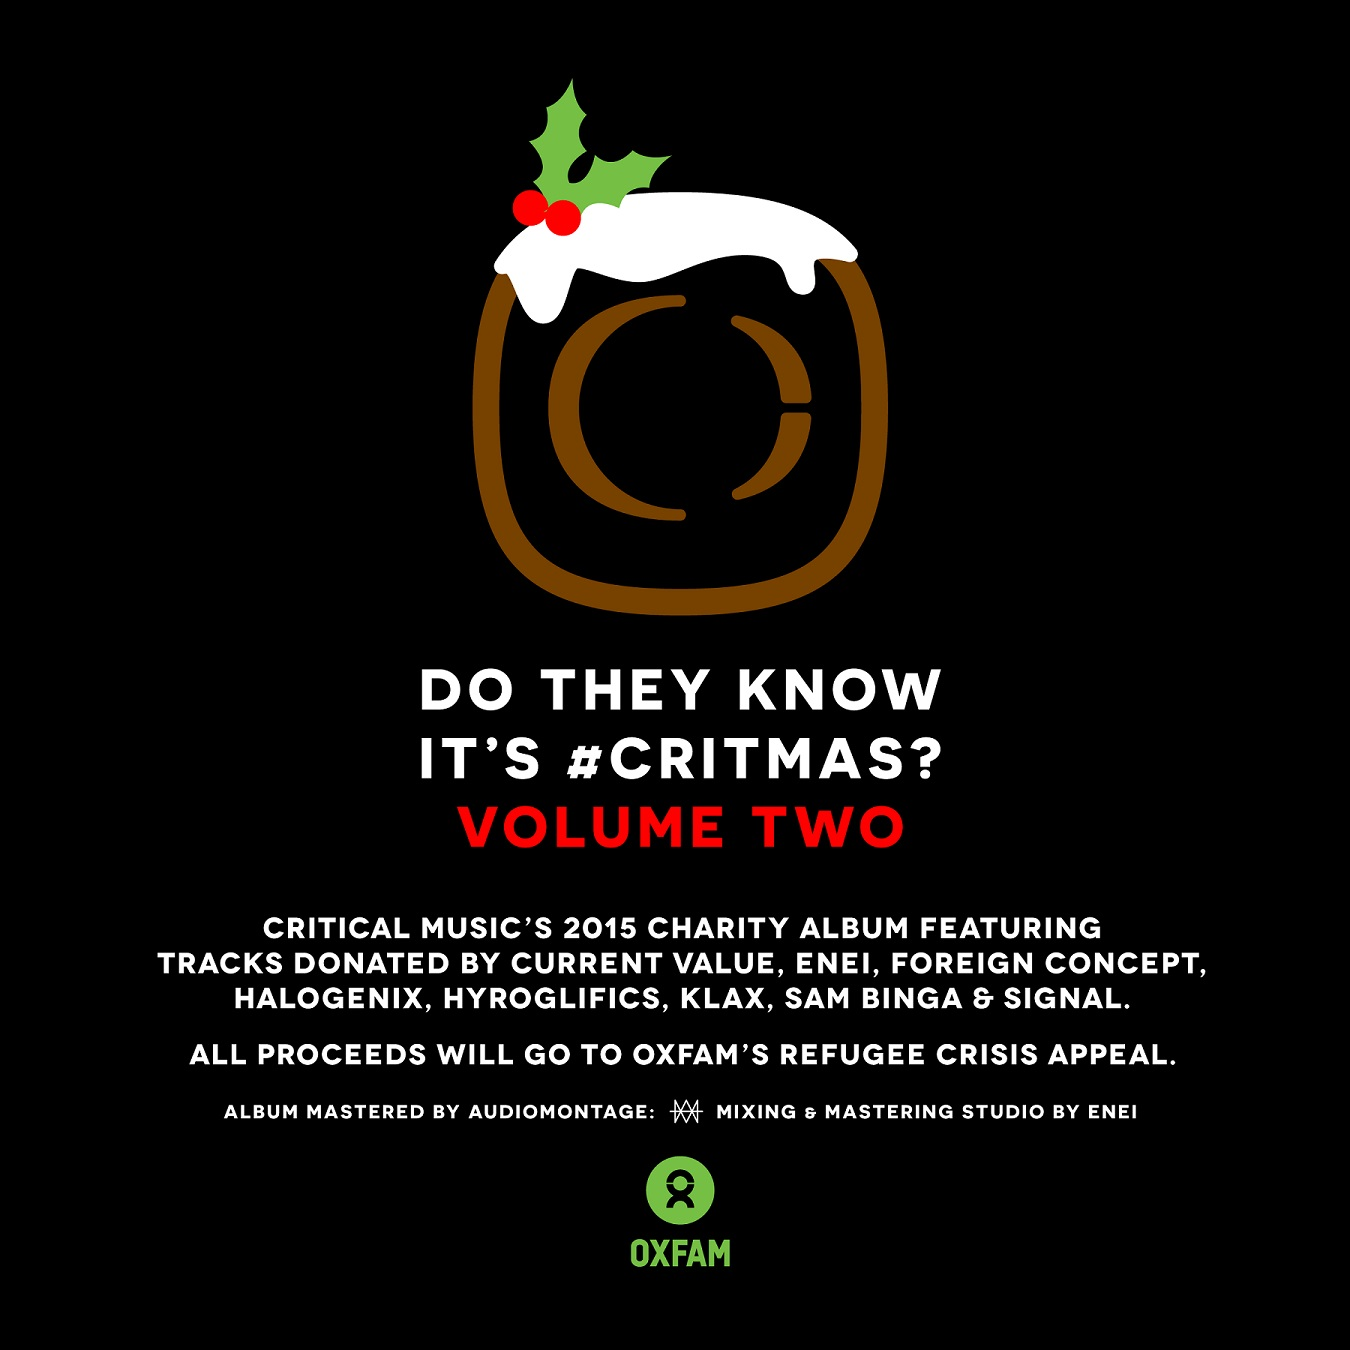 VA - Do They Know It's #Critmas Vol 2